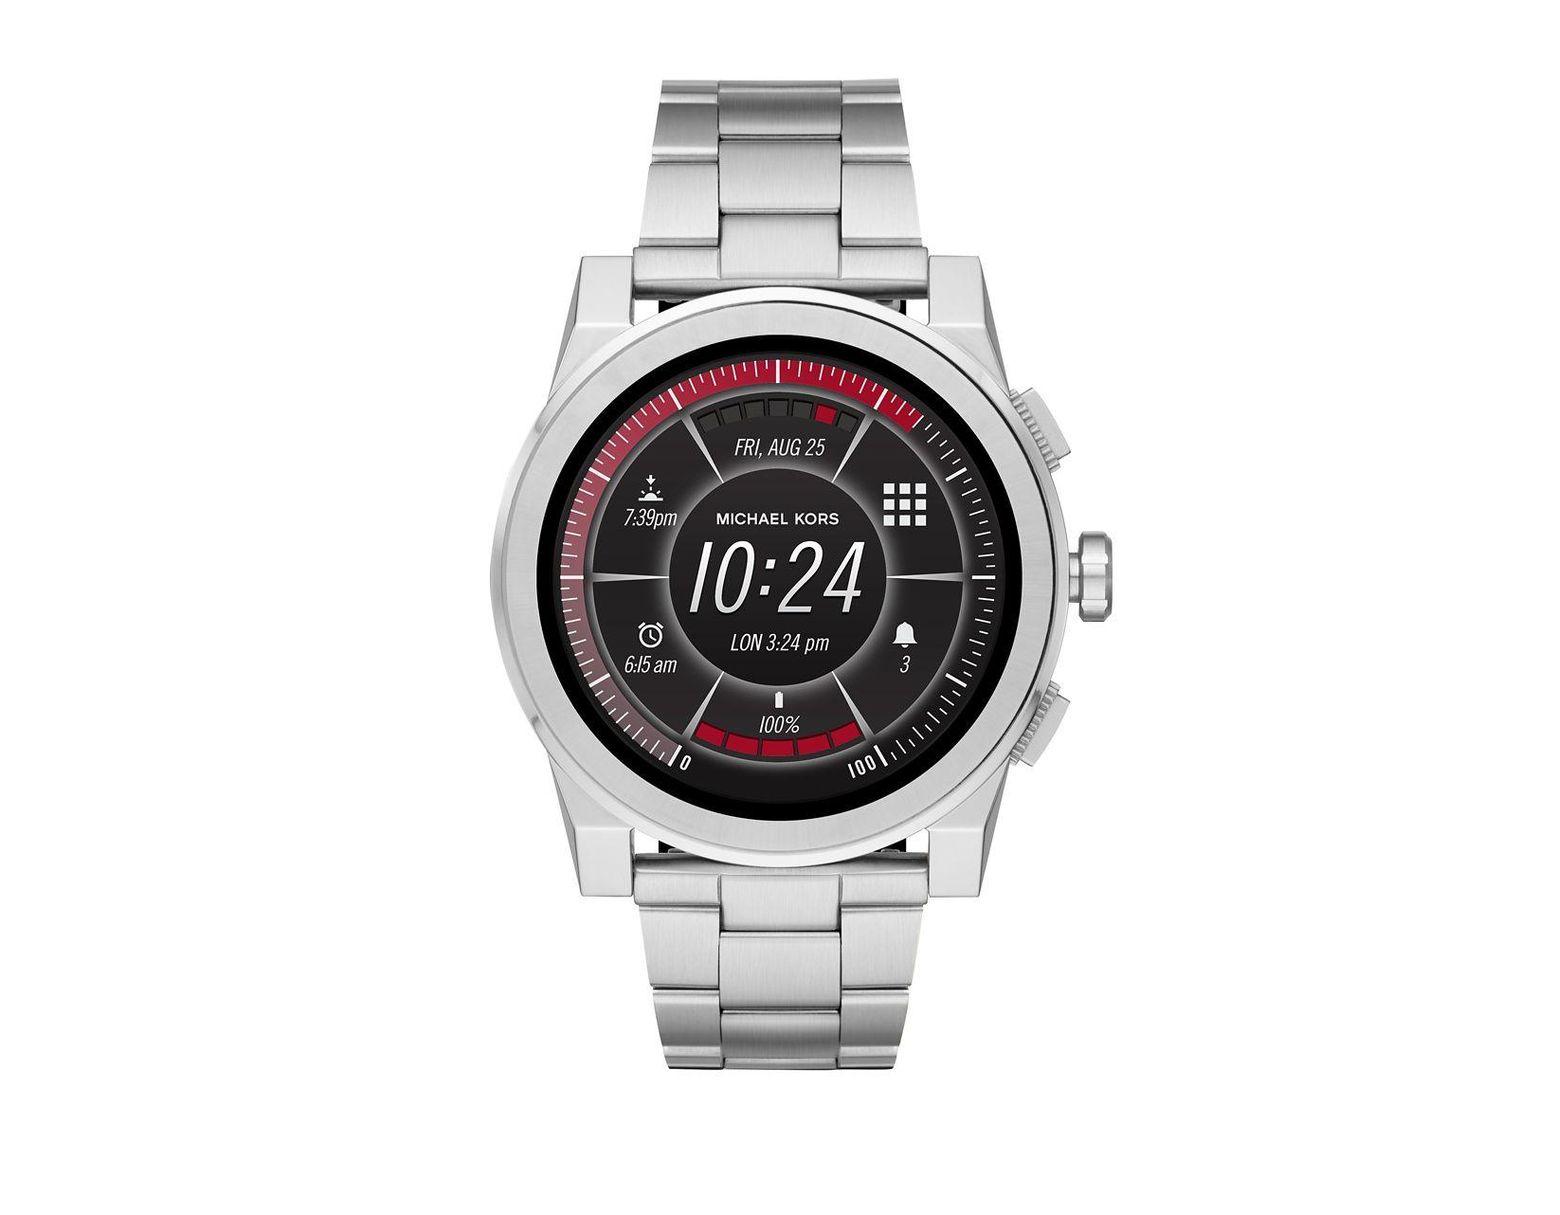 04be2a80a2cd Lyst - Michael Kors Access Grayson Stainless Steel Touchscreen Bracelet  Smart Watch in Metallic - Save 29%